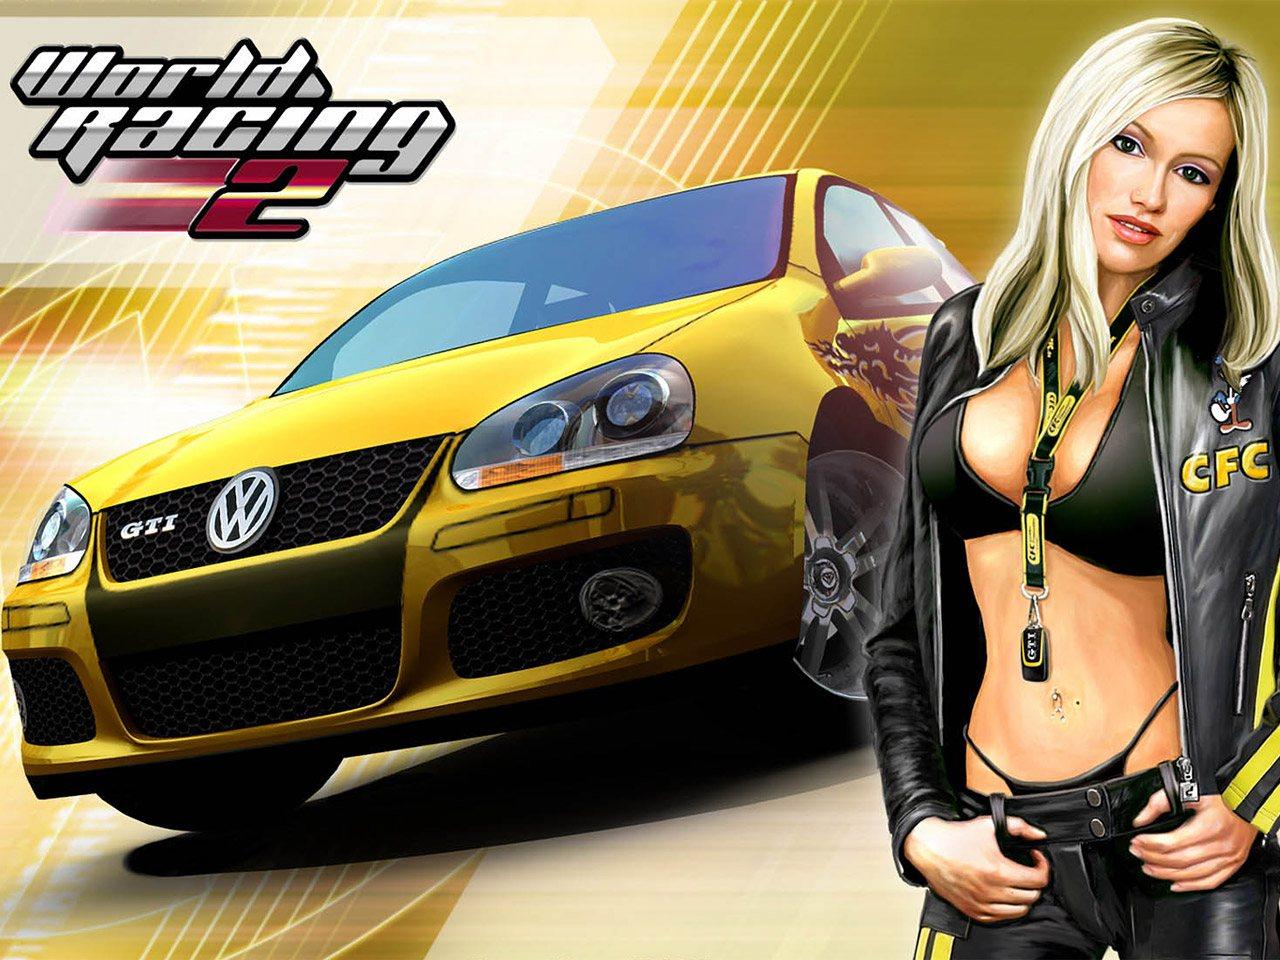 Car Girl Wallpapers Px, - World Racing 2 Girl , HD Wallpaper & Backgrounds